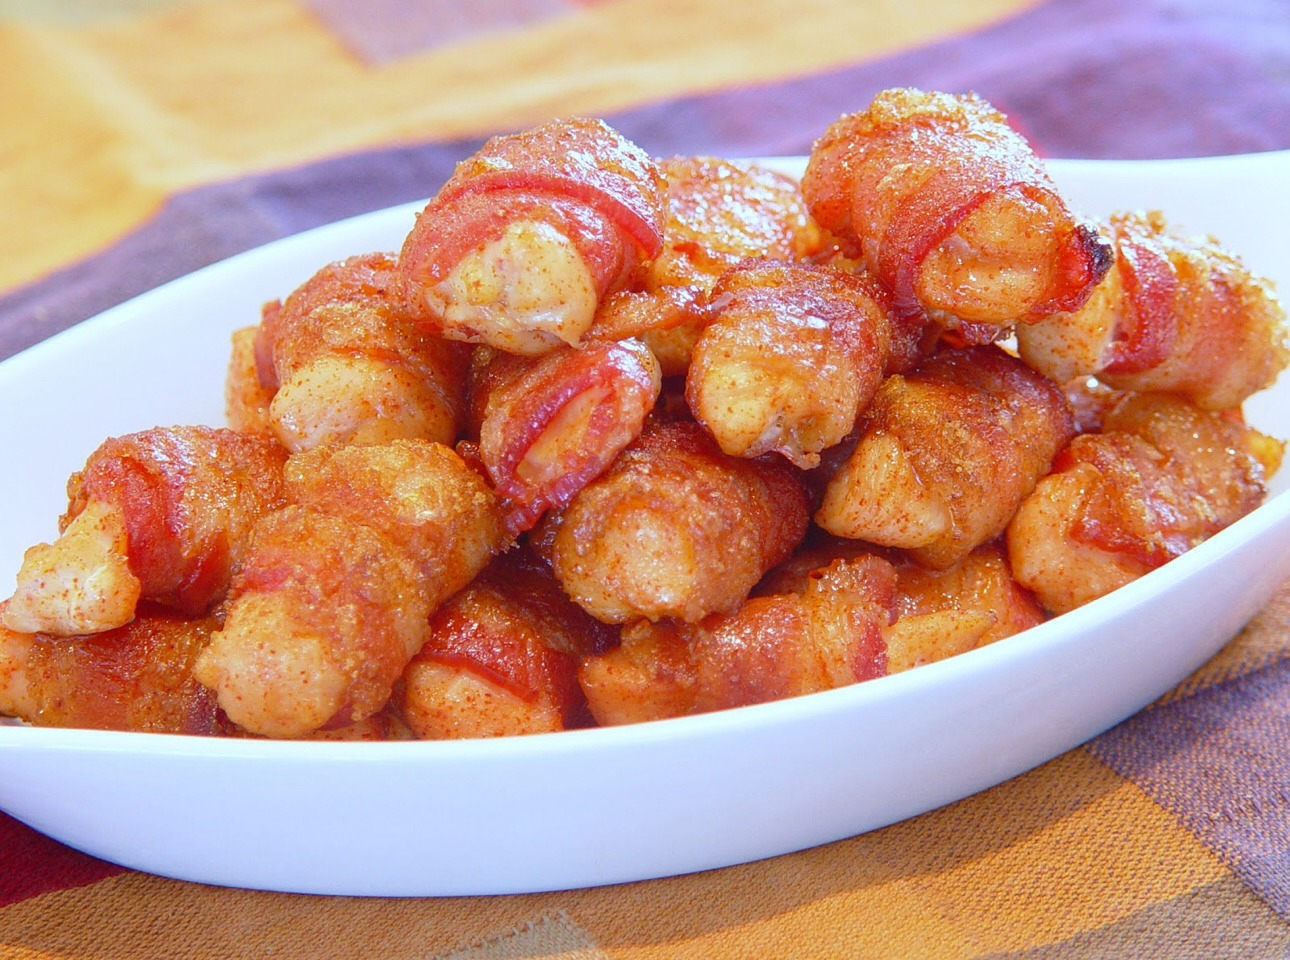 ... Appetizer Or Side Dish: Bacon Wrapped Chicken Bites | Trusper